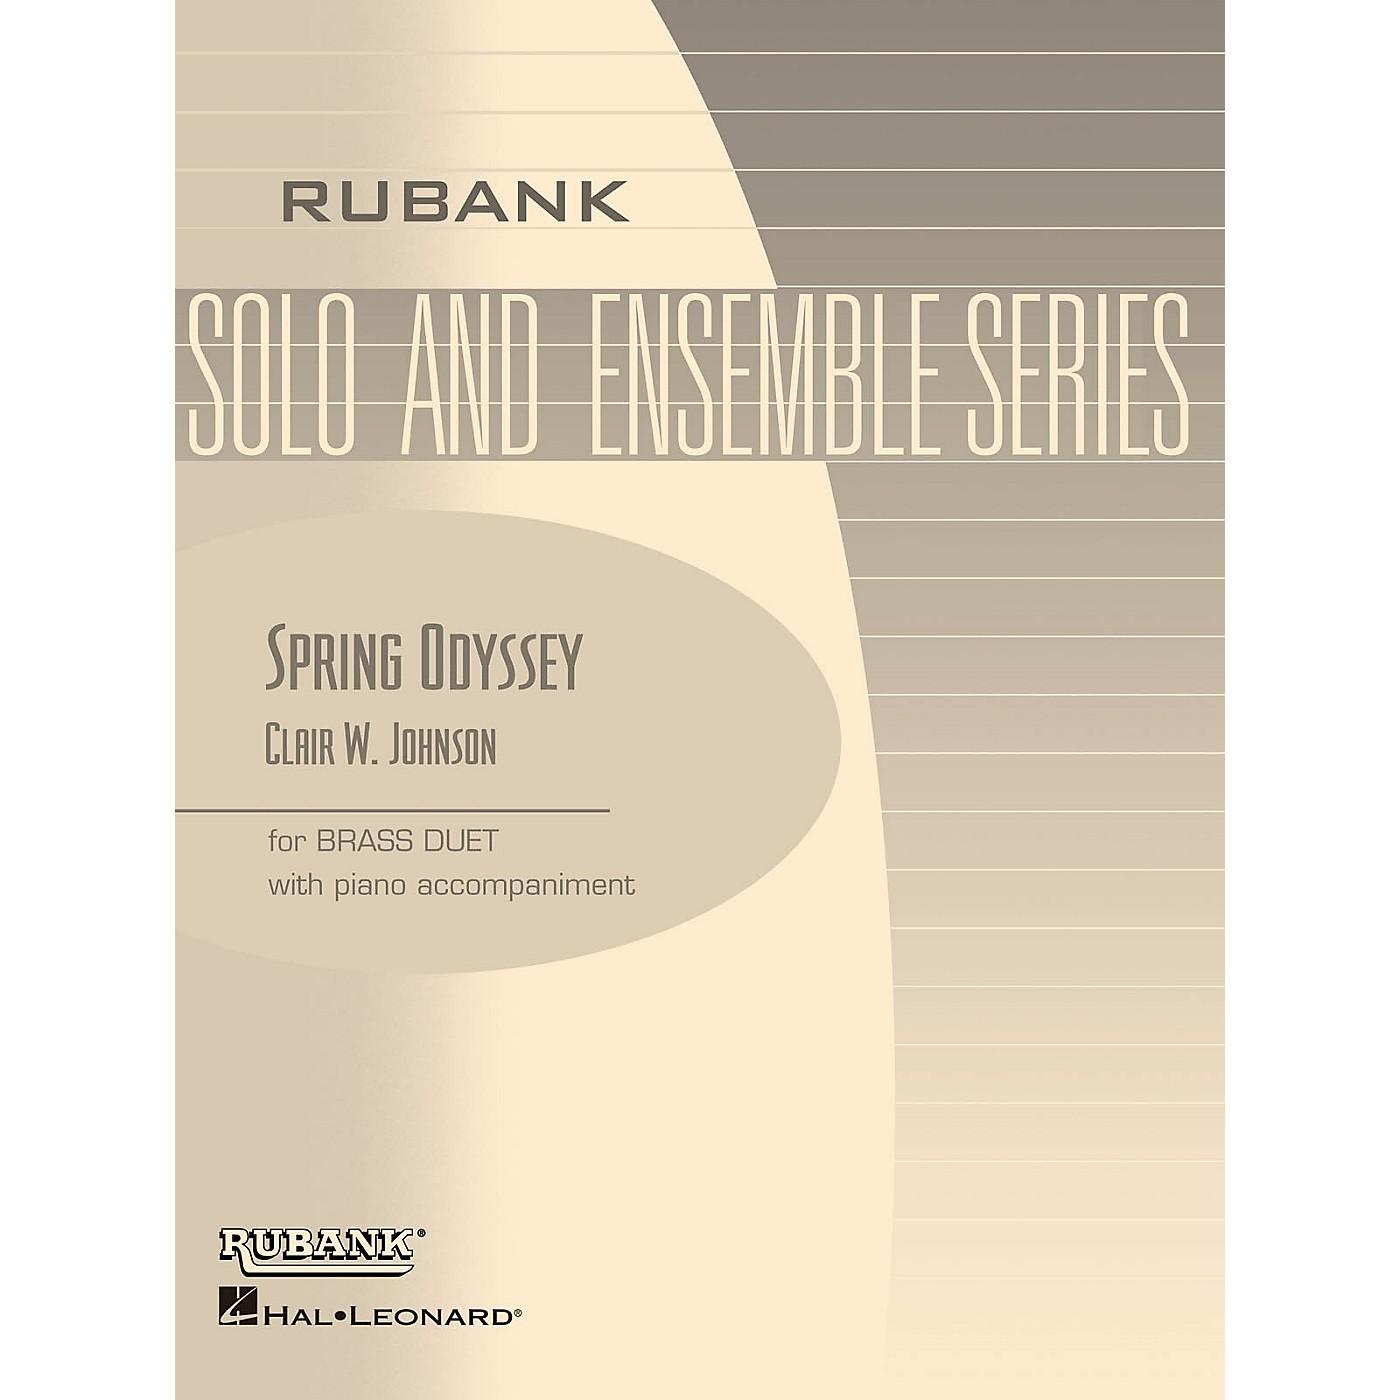 Rubank Publications Spring Odyssey (Brass Duet with Piano - Grade 3) Rubank Solo/Ensemble Sheet Series Book thumbnail